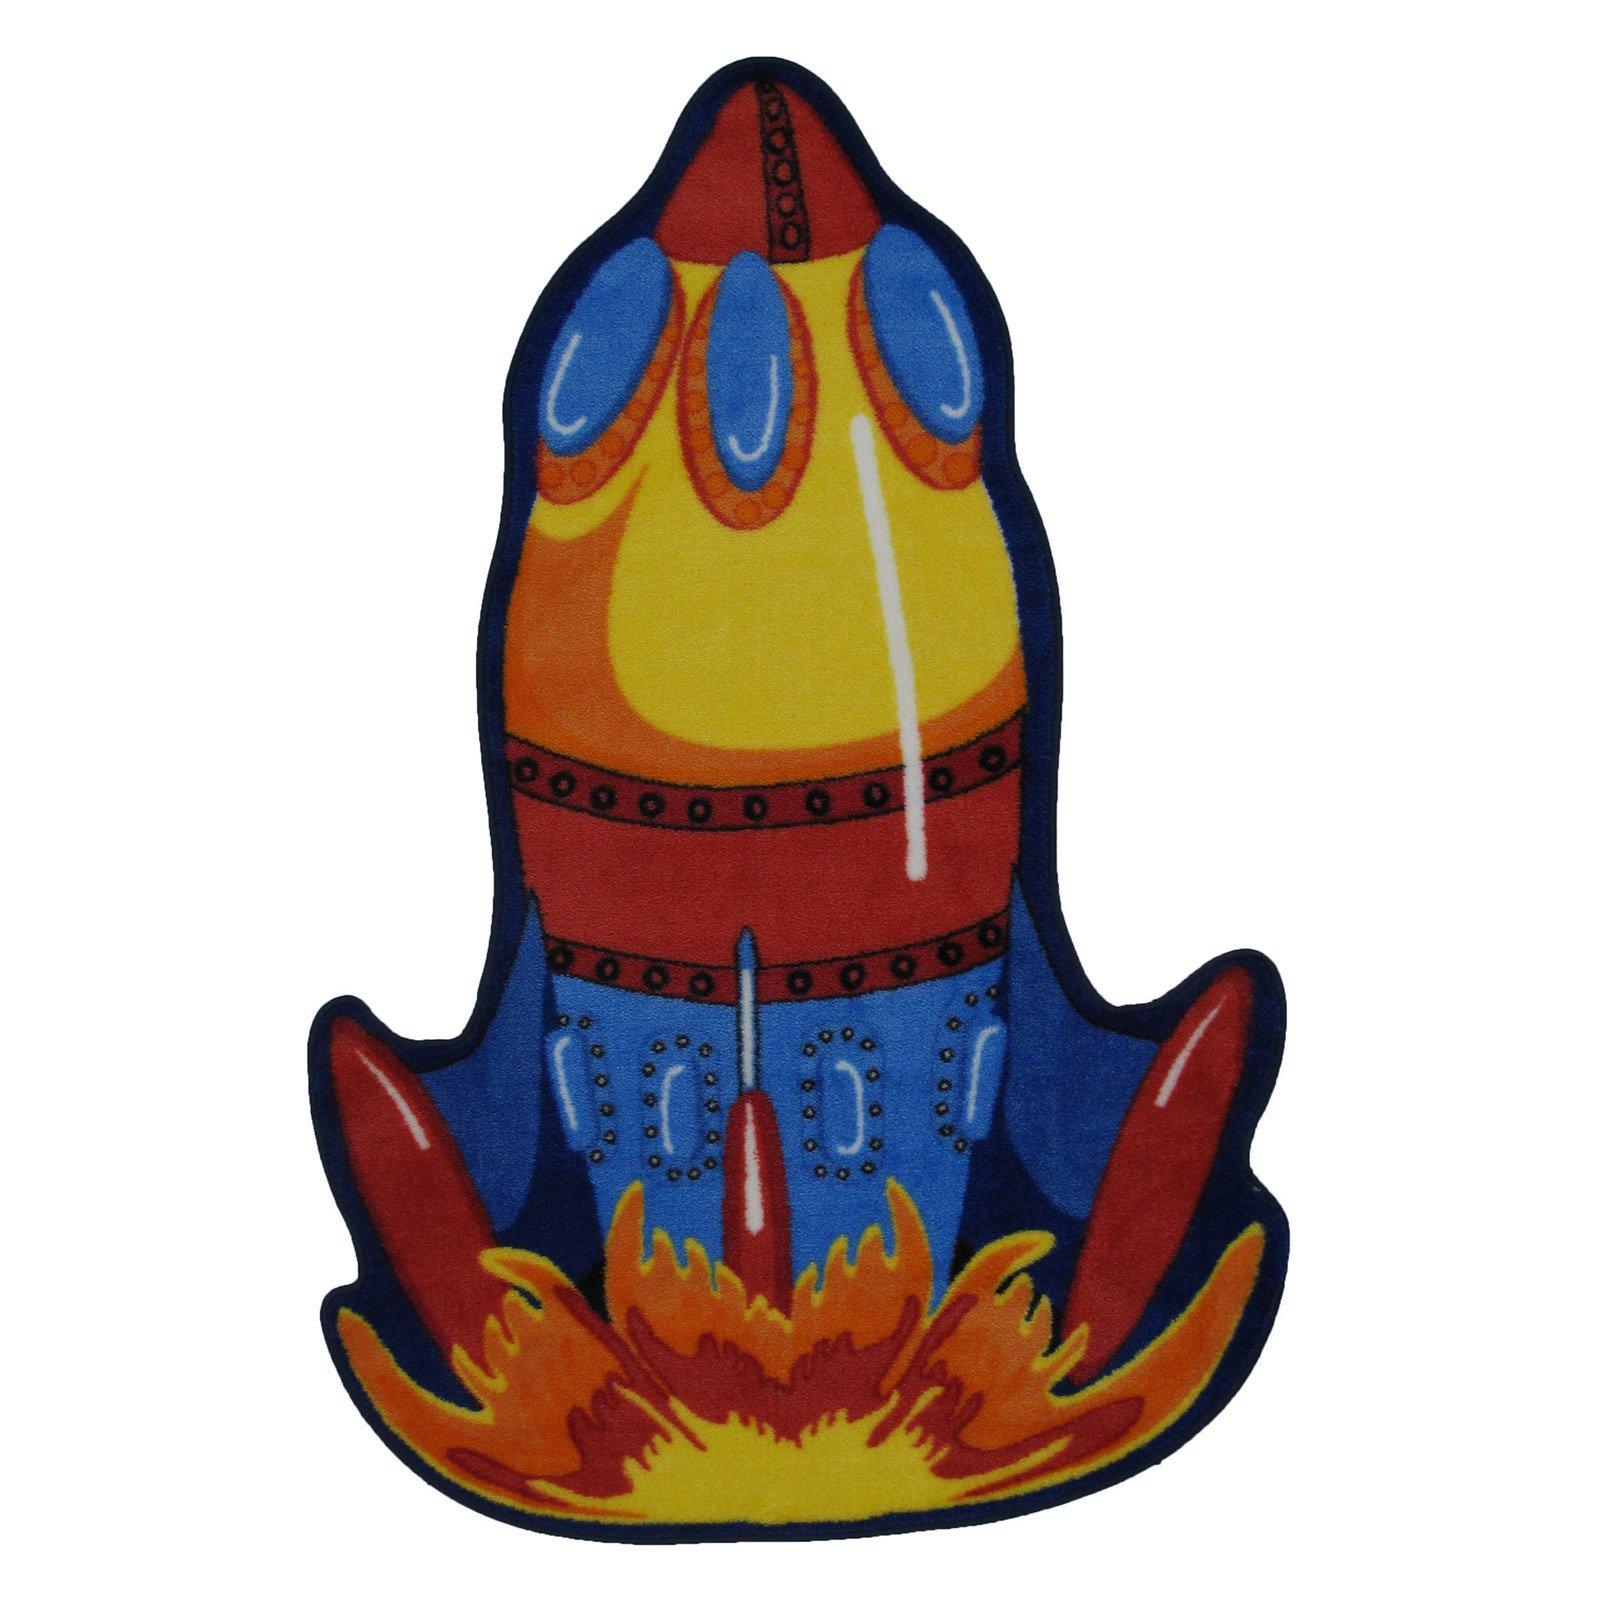 "Fun Rugs Rocket 39"" x 58"" Rug"